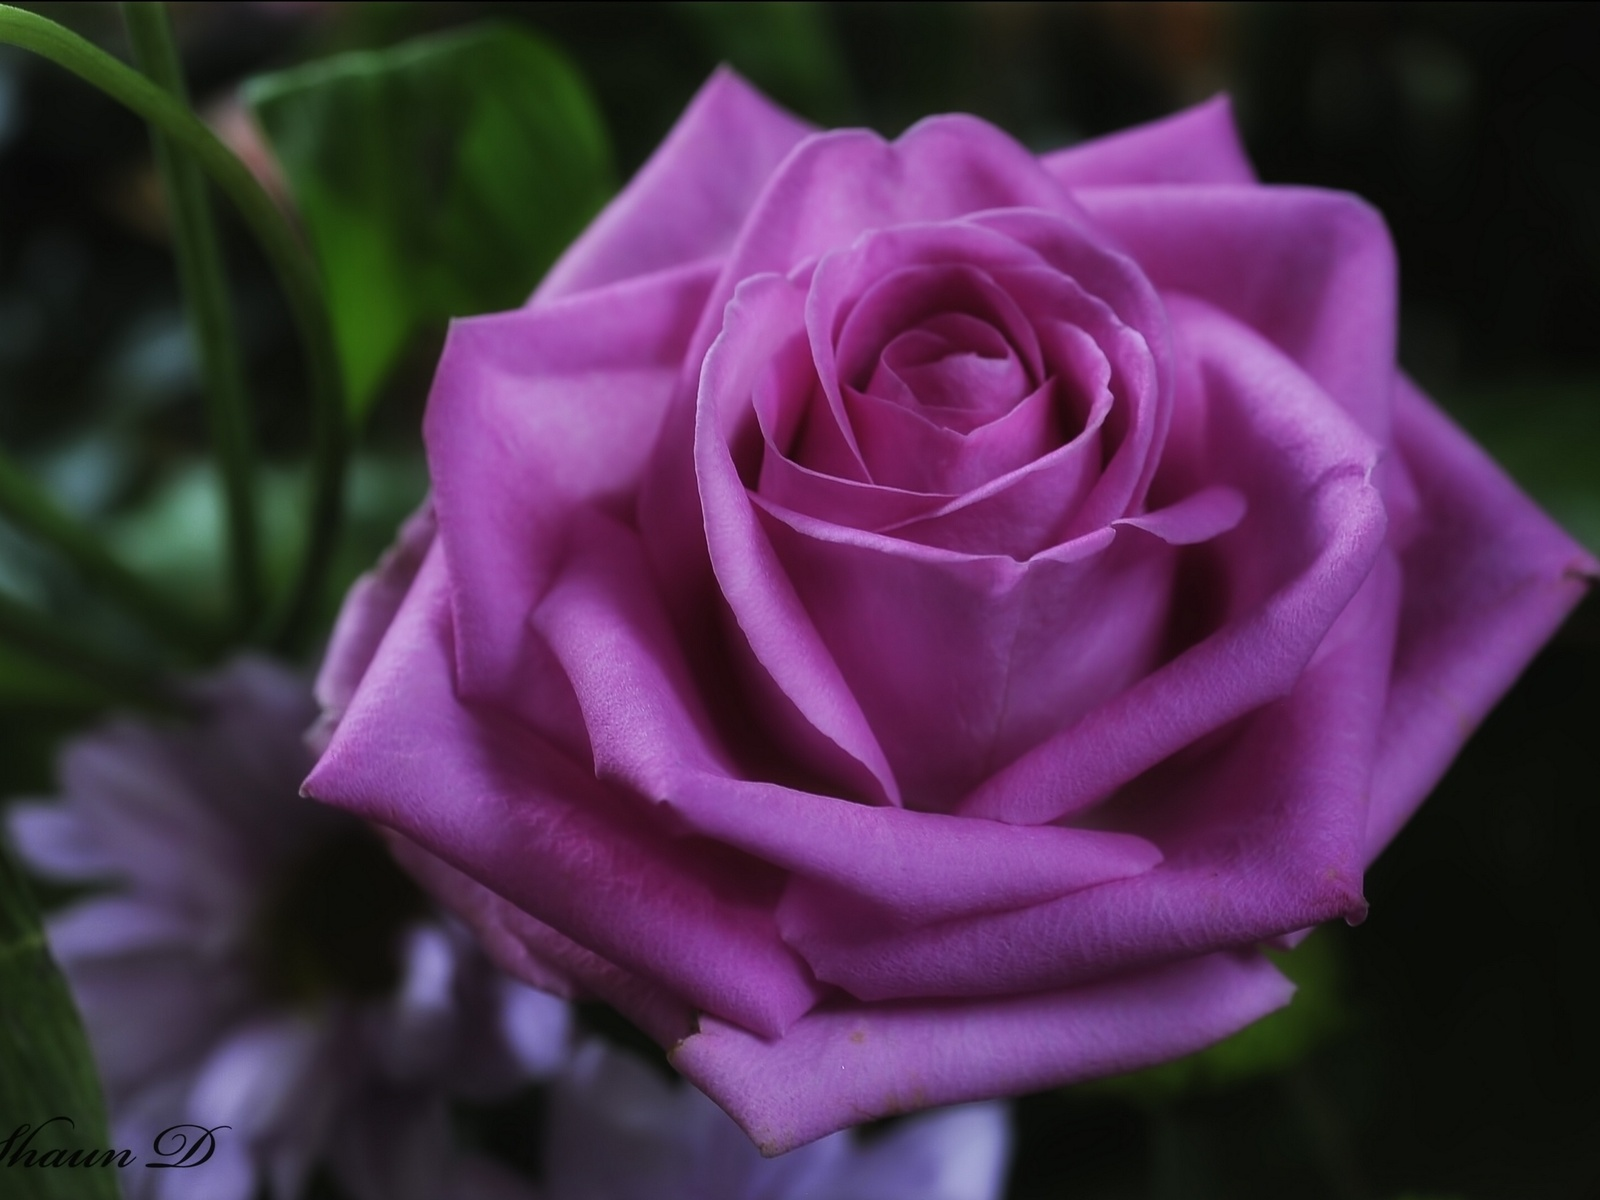 Image gallery imagenes de rosas moradas - Rosas rosas hermosas ...